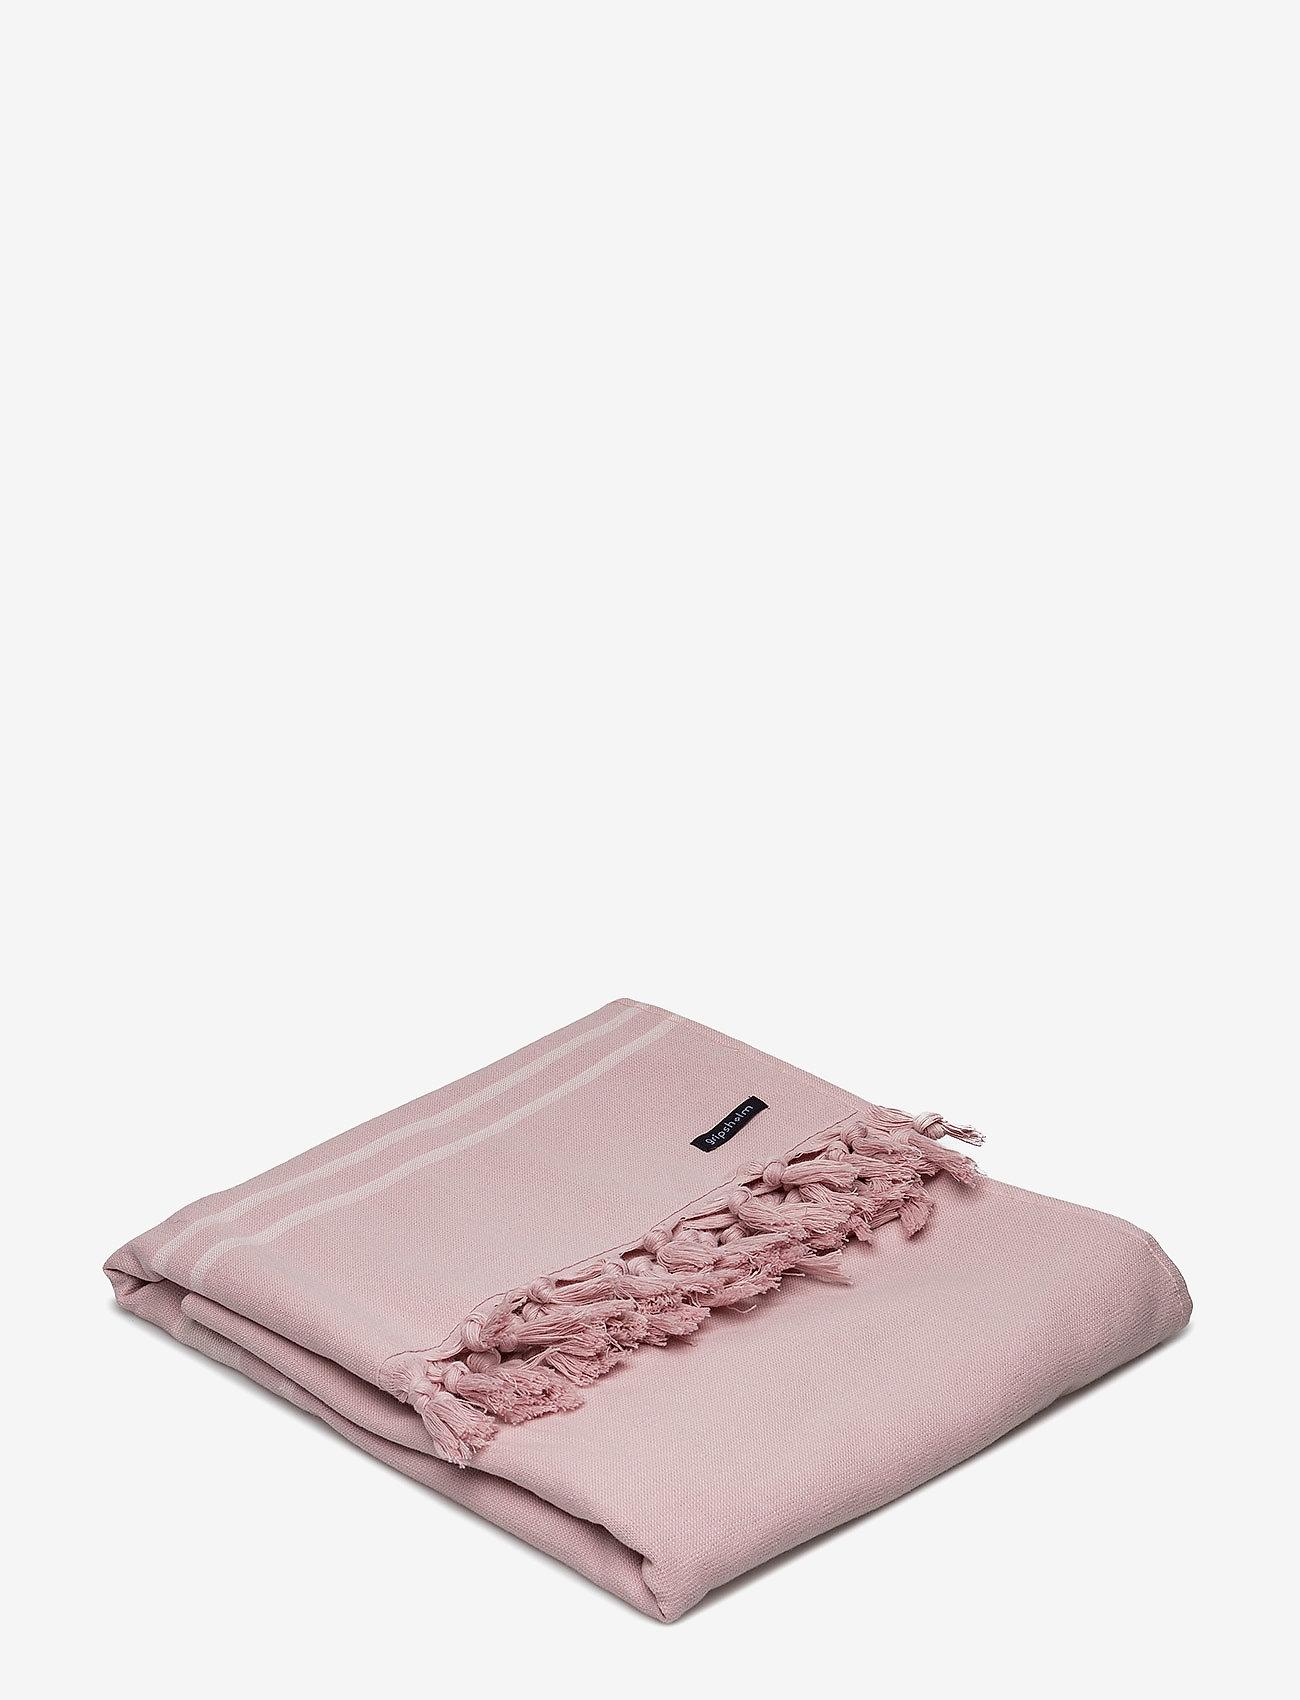 Gripsholm - TOWEL HAMAM - towels - pink lilac - 0